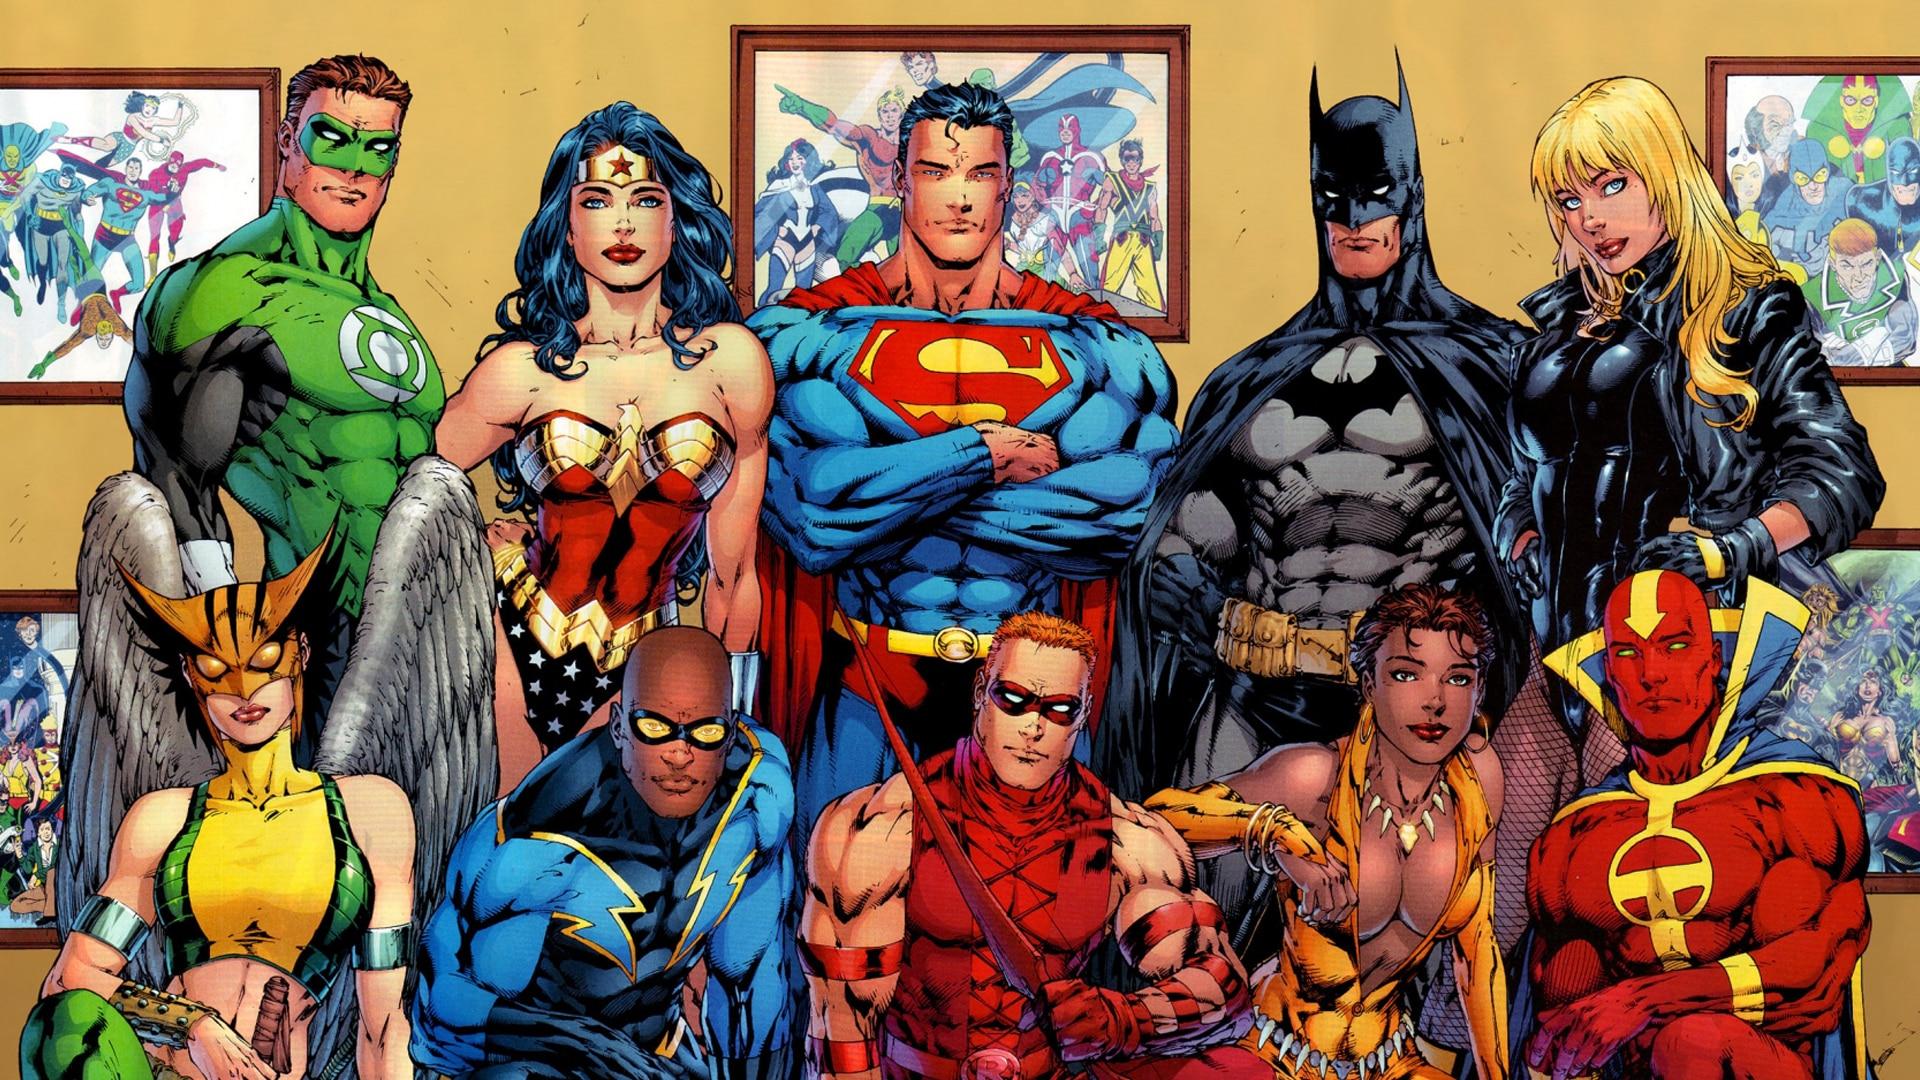 aliexpresscom buy batman superman deadpool spider man wolverine harley quinn darth maul green lantern iron man venom captain america poster from reliable batman superman iron man